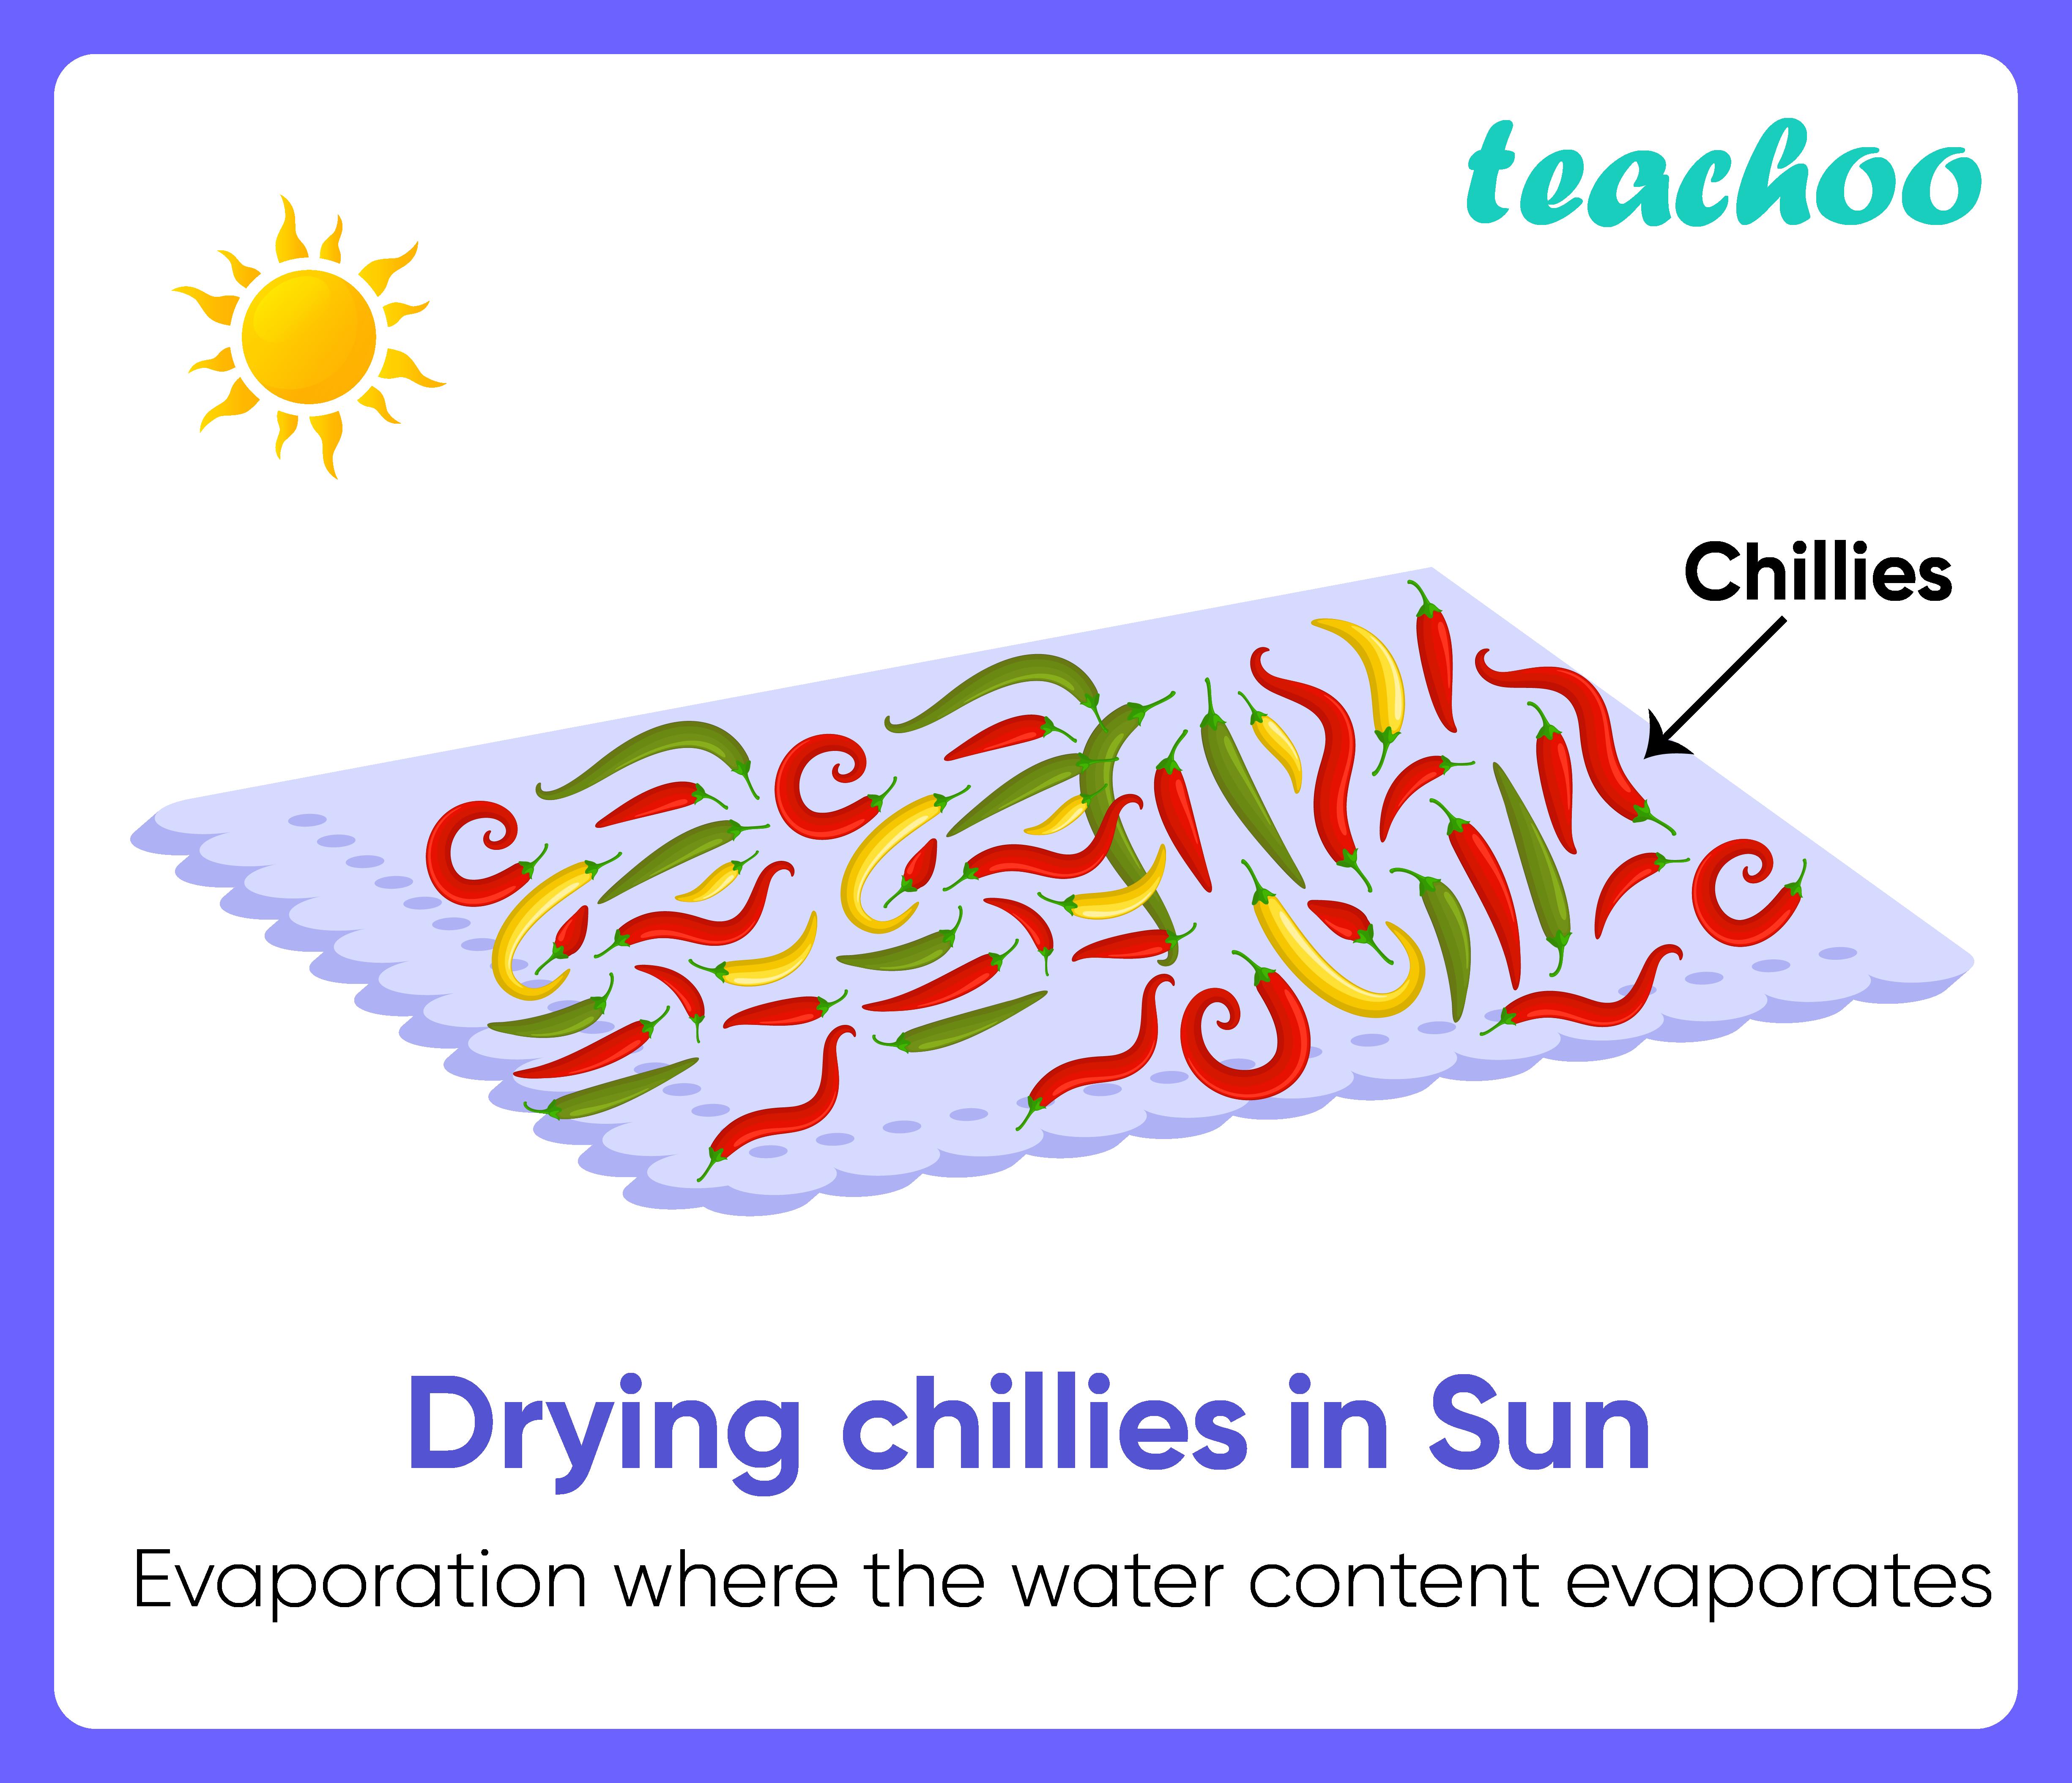 Drying chillies in Sun-Teachoo.png